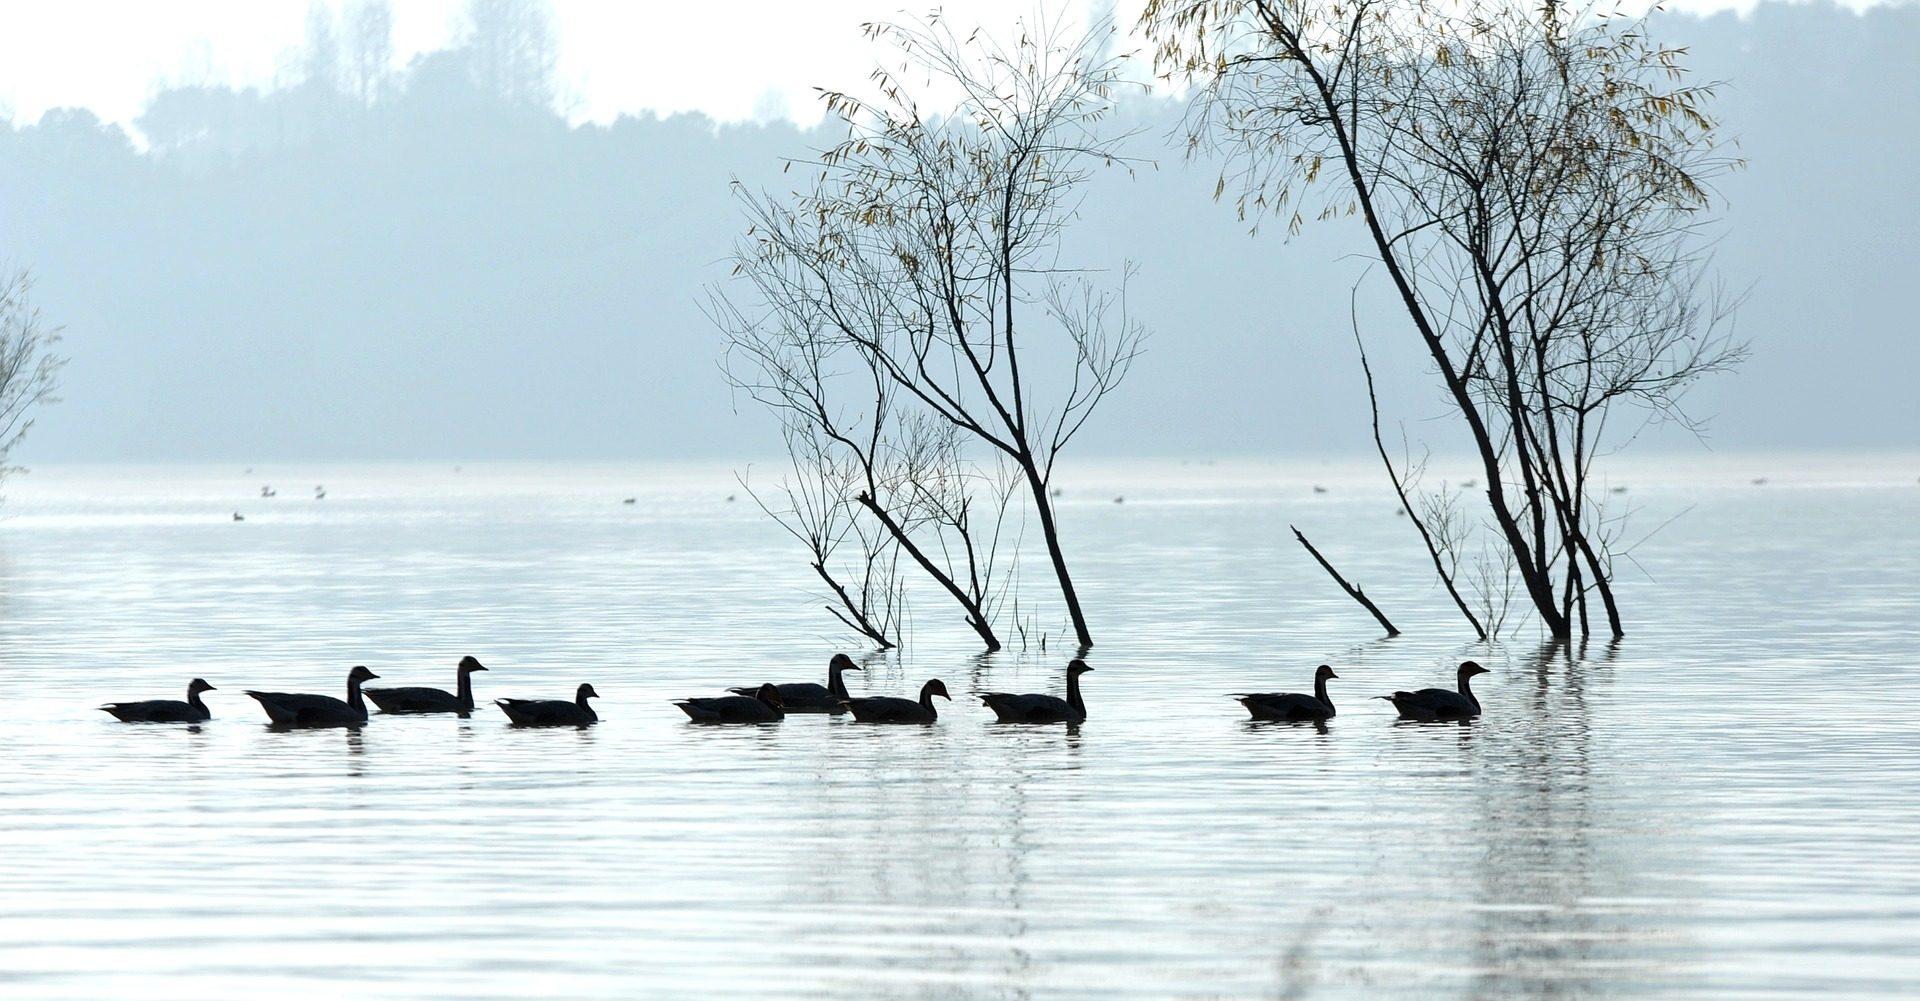 Lake, Dawn, Nebel, Enten, Baum - Wallpaper HD - Prof.-falken.com